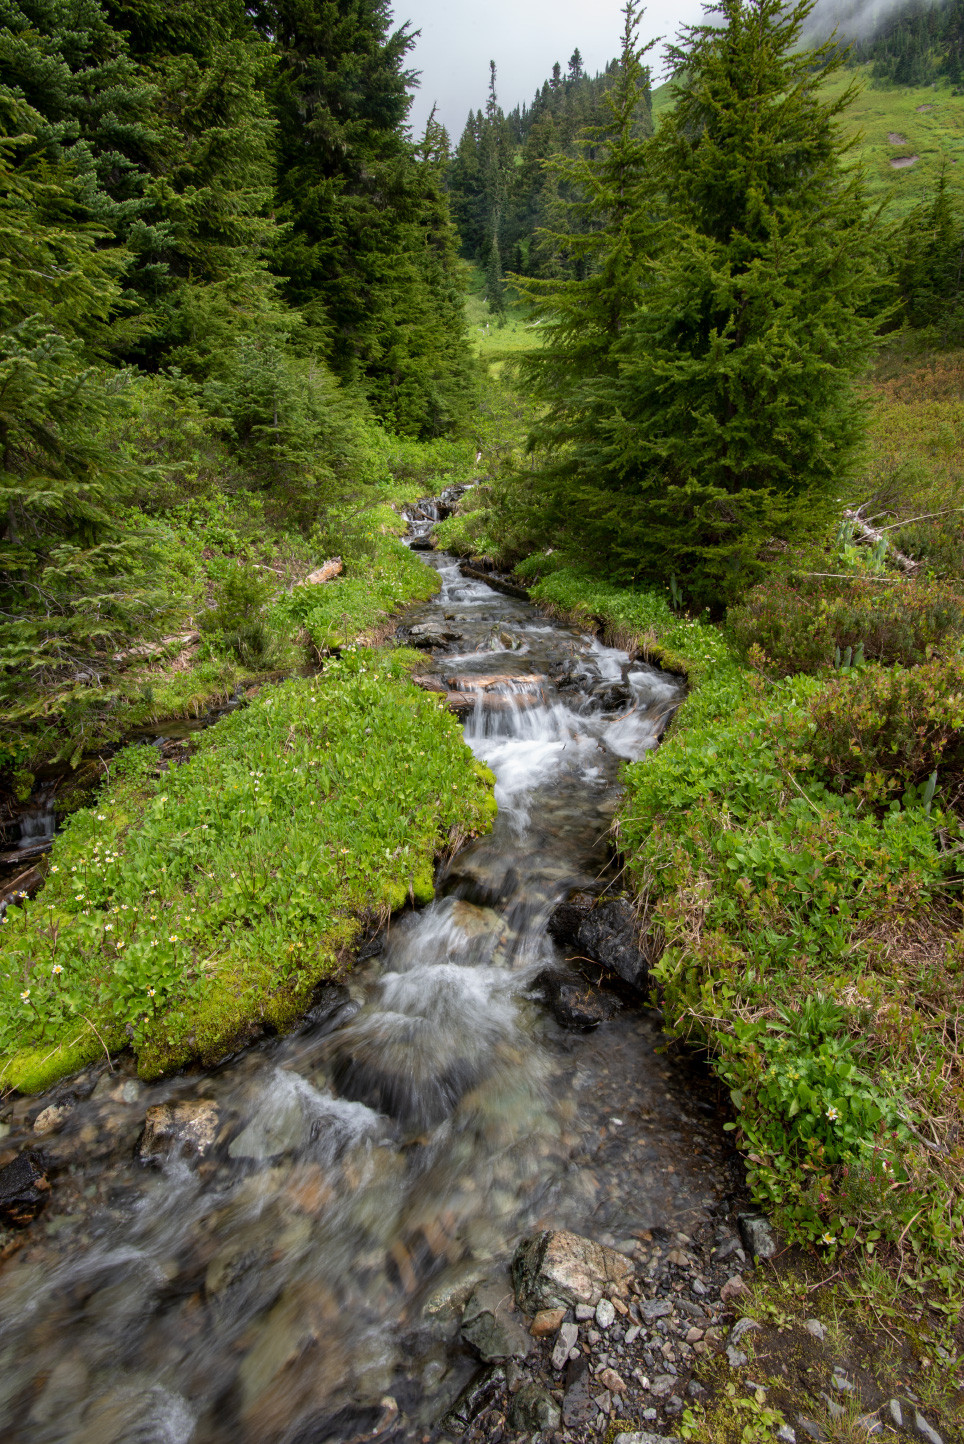 Deerhorn Creek in the Church Mountain meadows